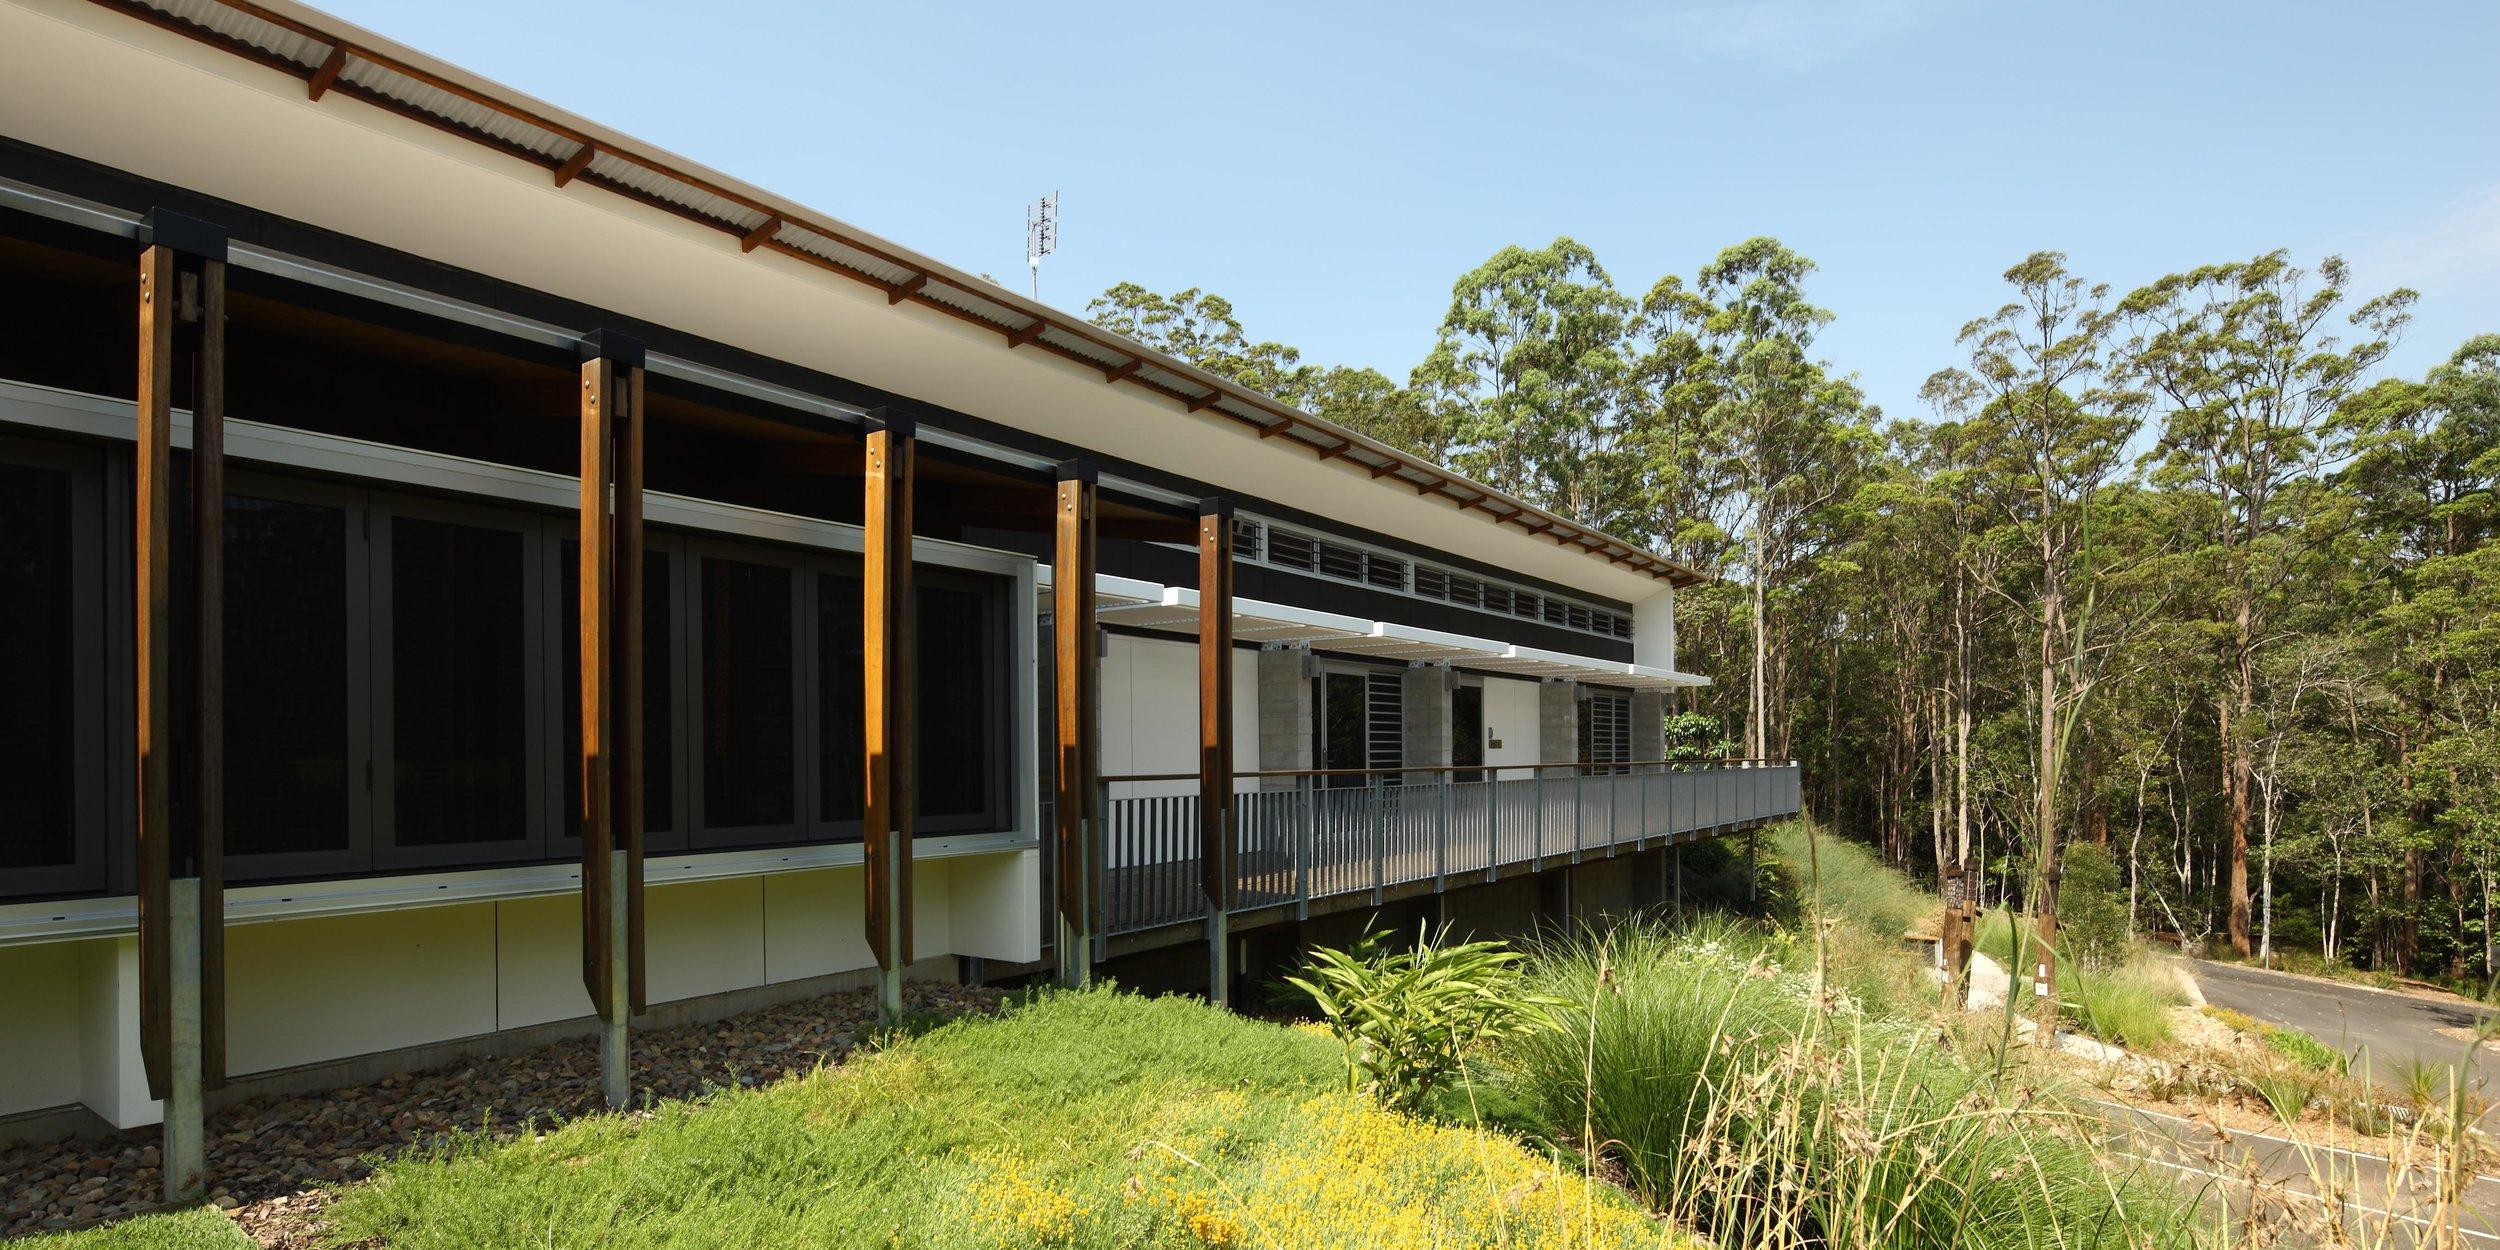 Maroochy-Botanic-Gardens-Guymer-Bailey-Architects-07.jpg